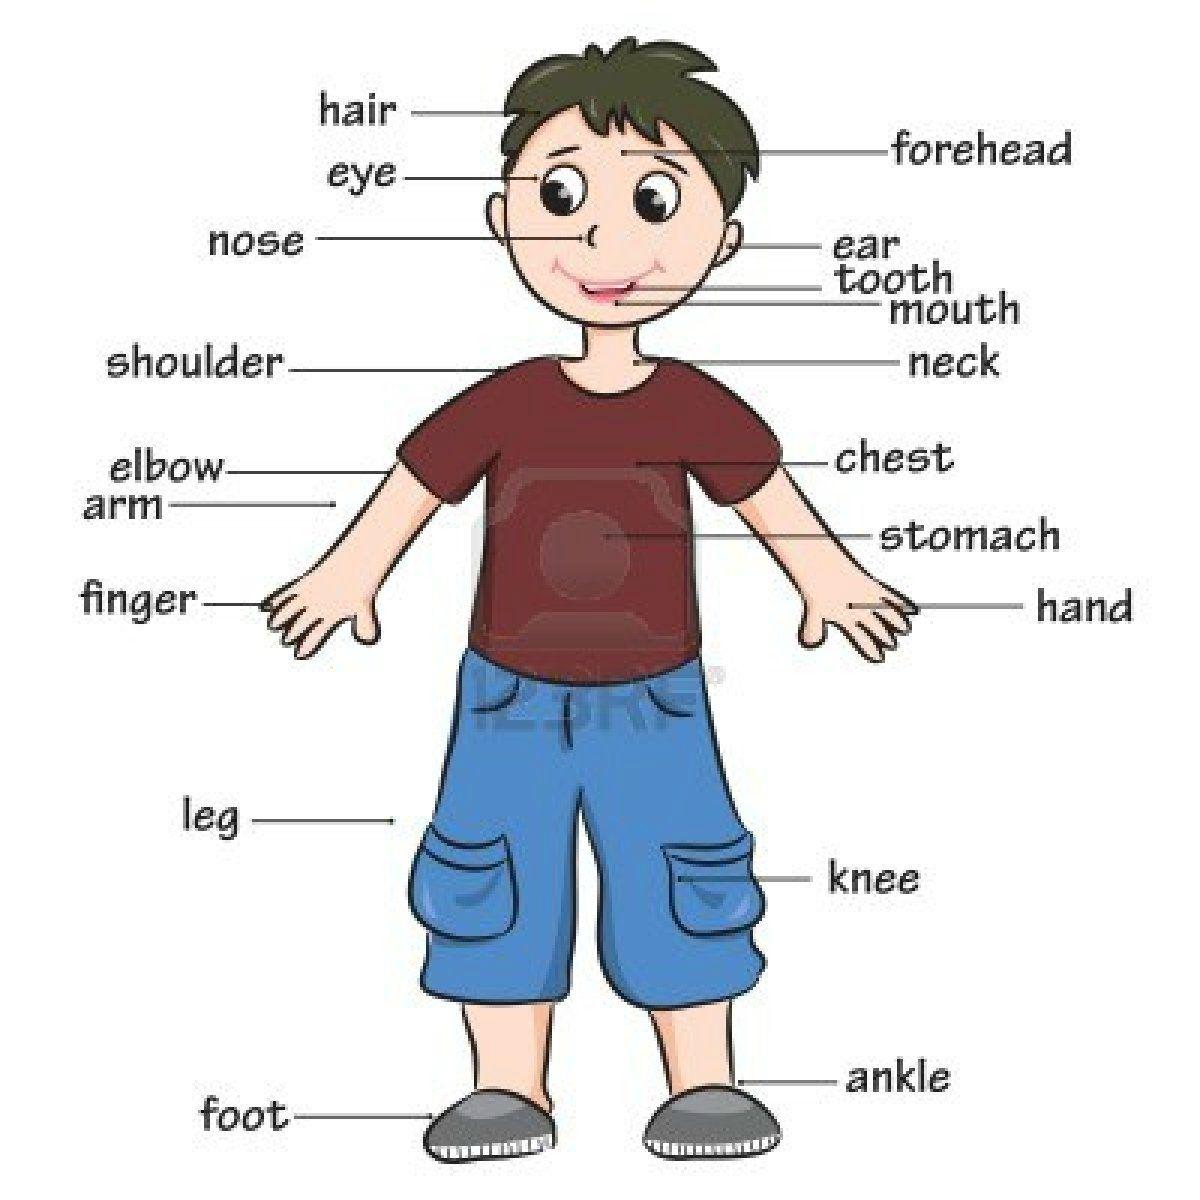 15354745-cartoon-child-vocabulary-of-body-parts